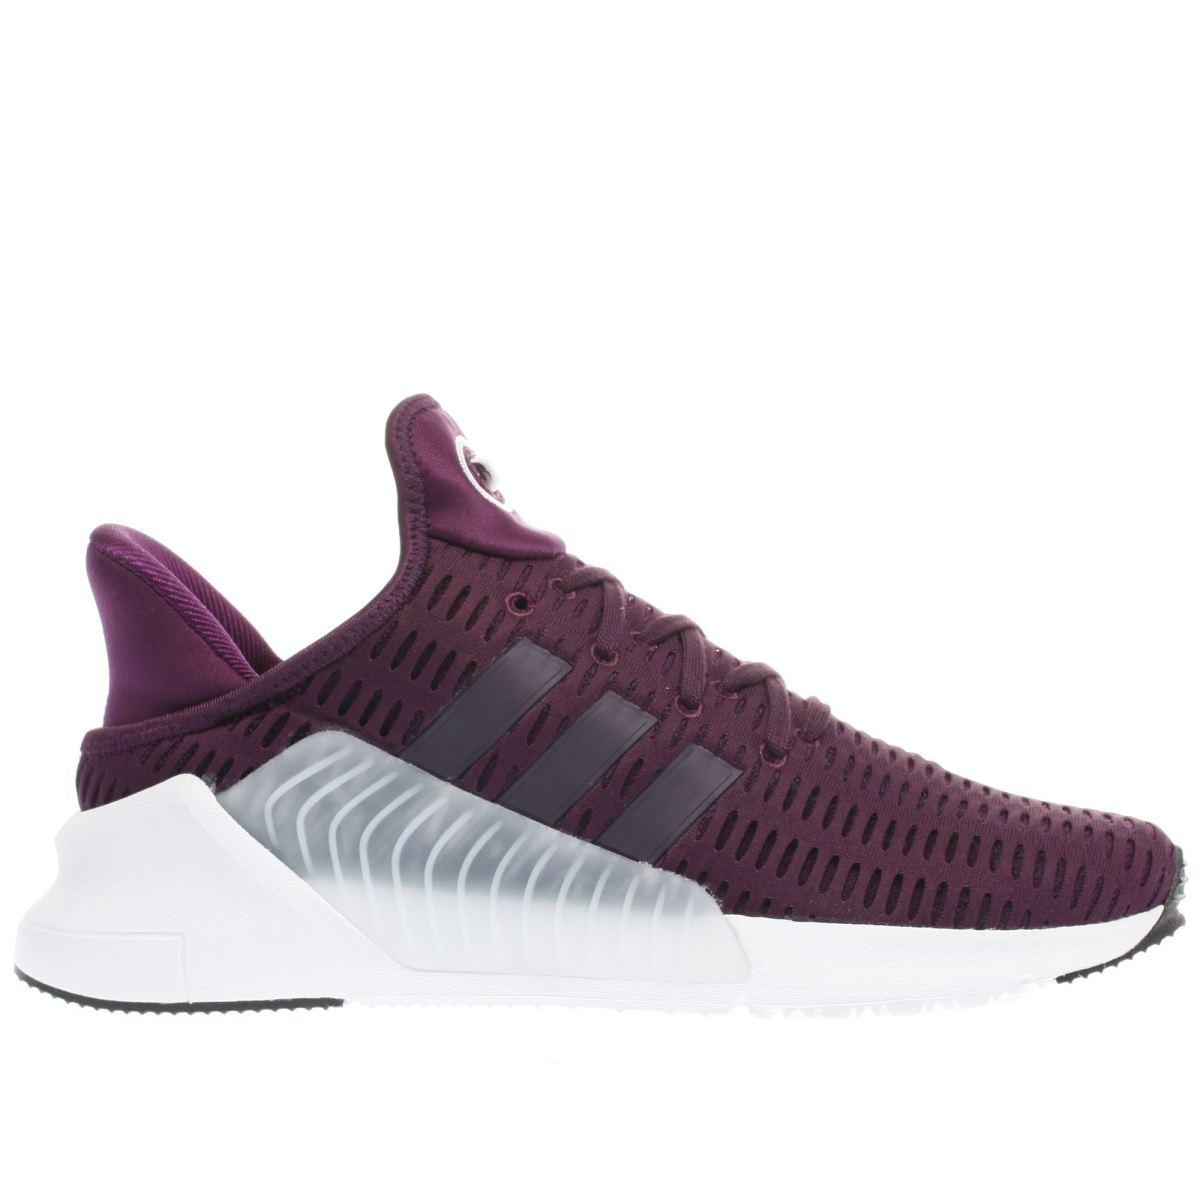 adidas purple climacool 02/17 trainers